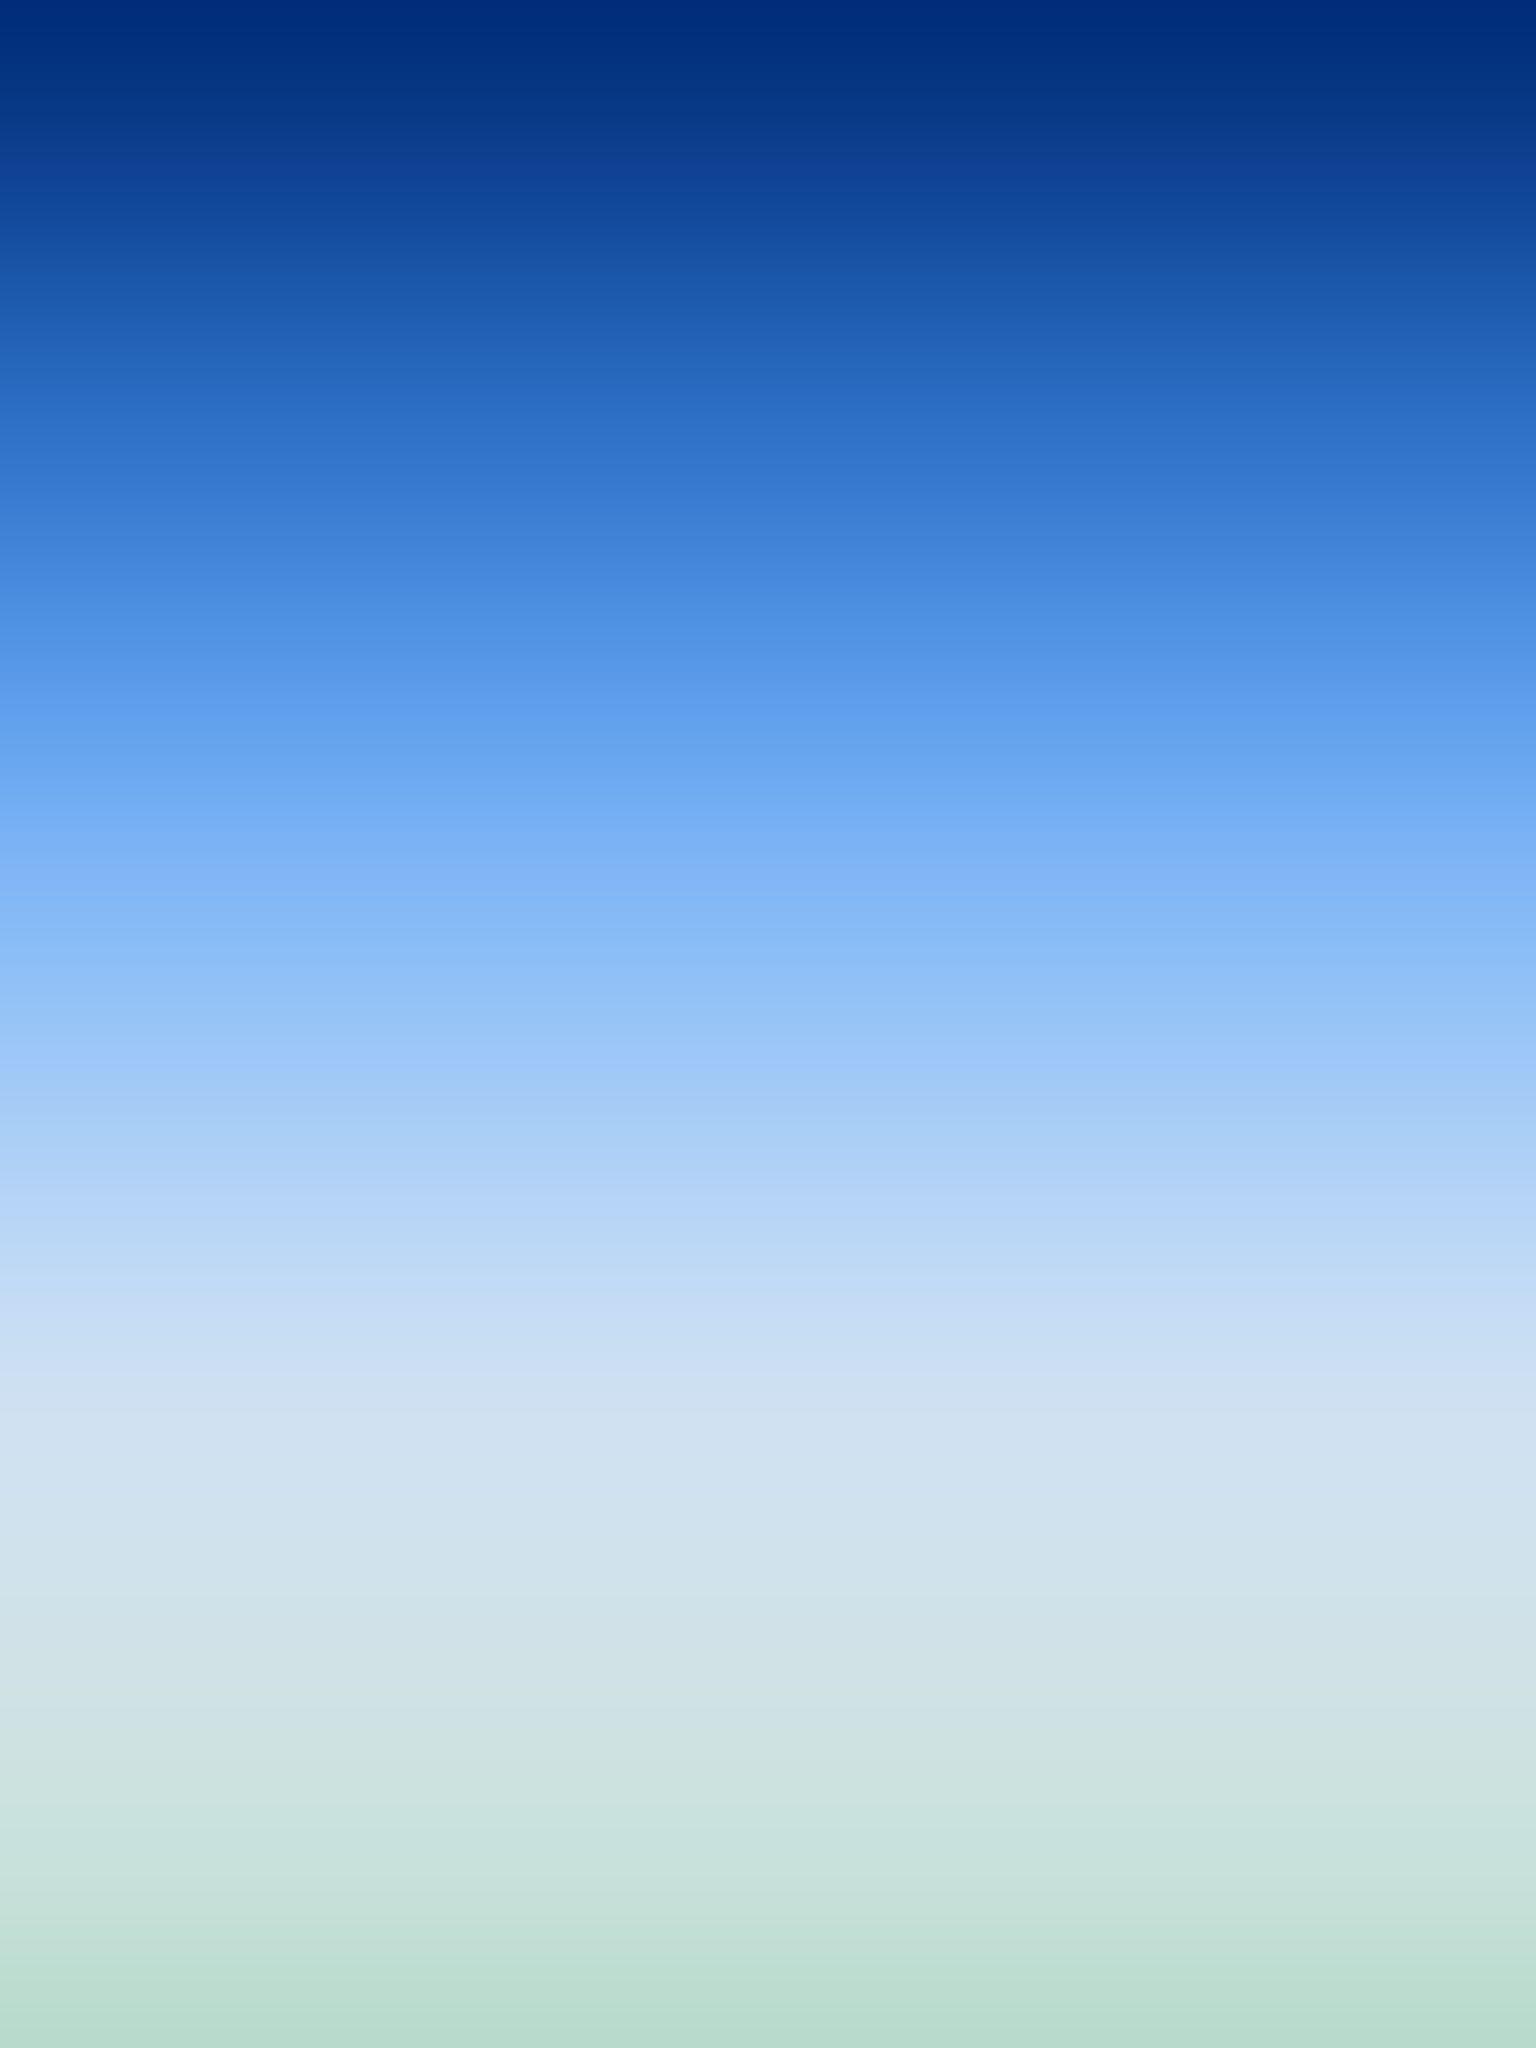 ipad air blue green gradient wallpaper apple in 2018 pinterest